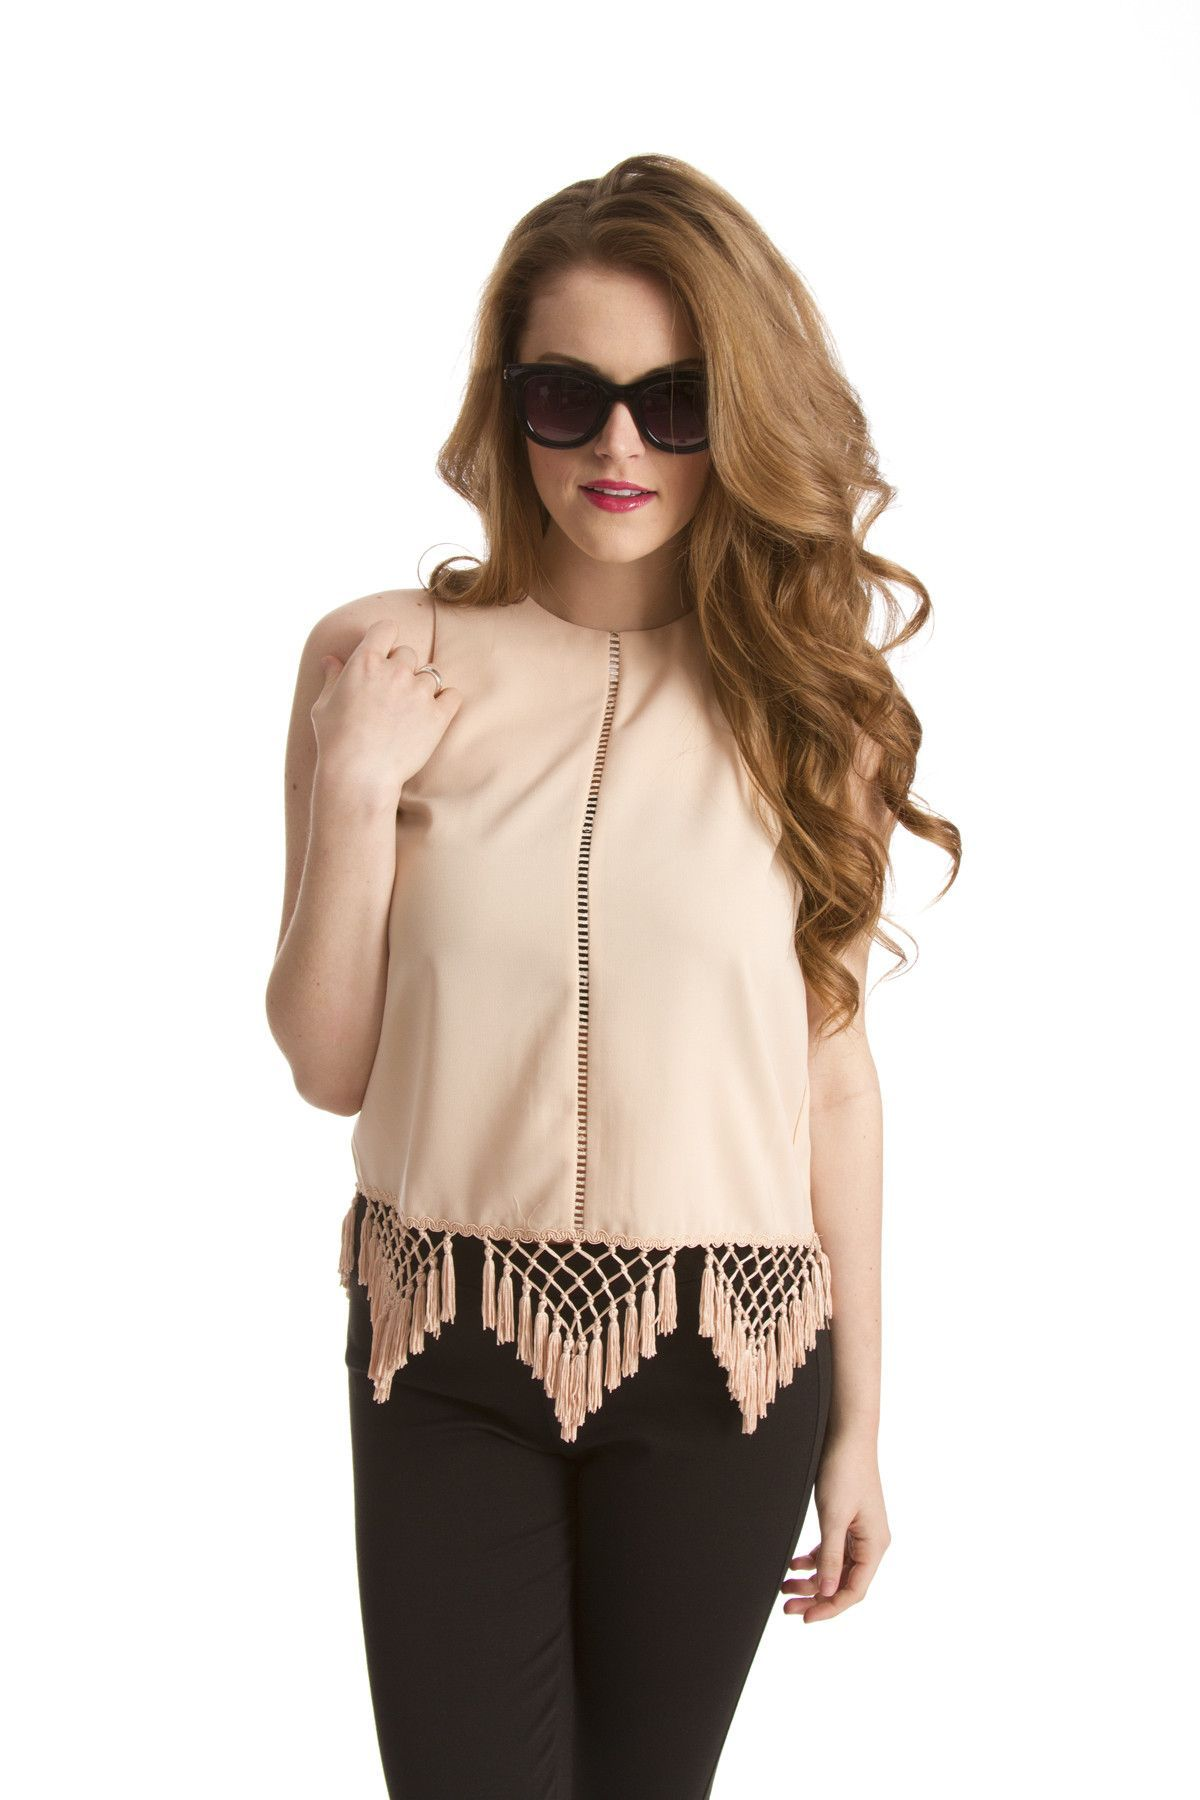 Women's Top- Dress Top w/ Tassel Hem